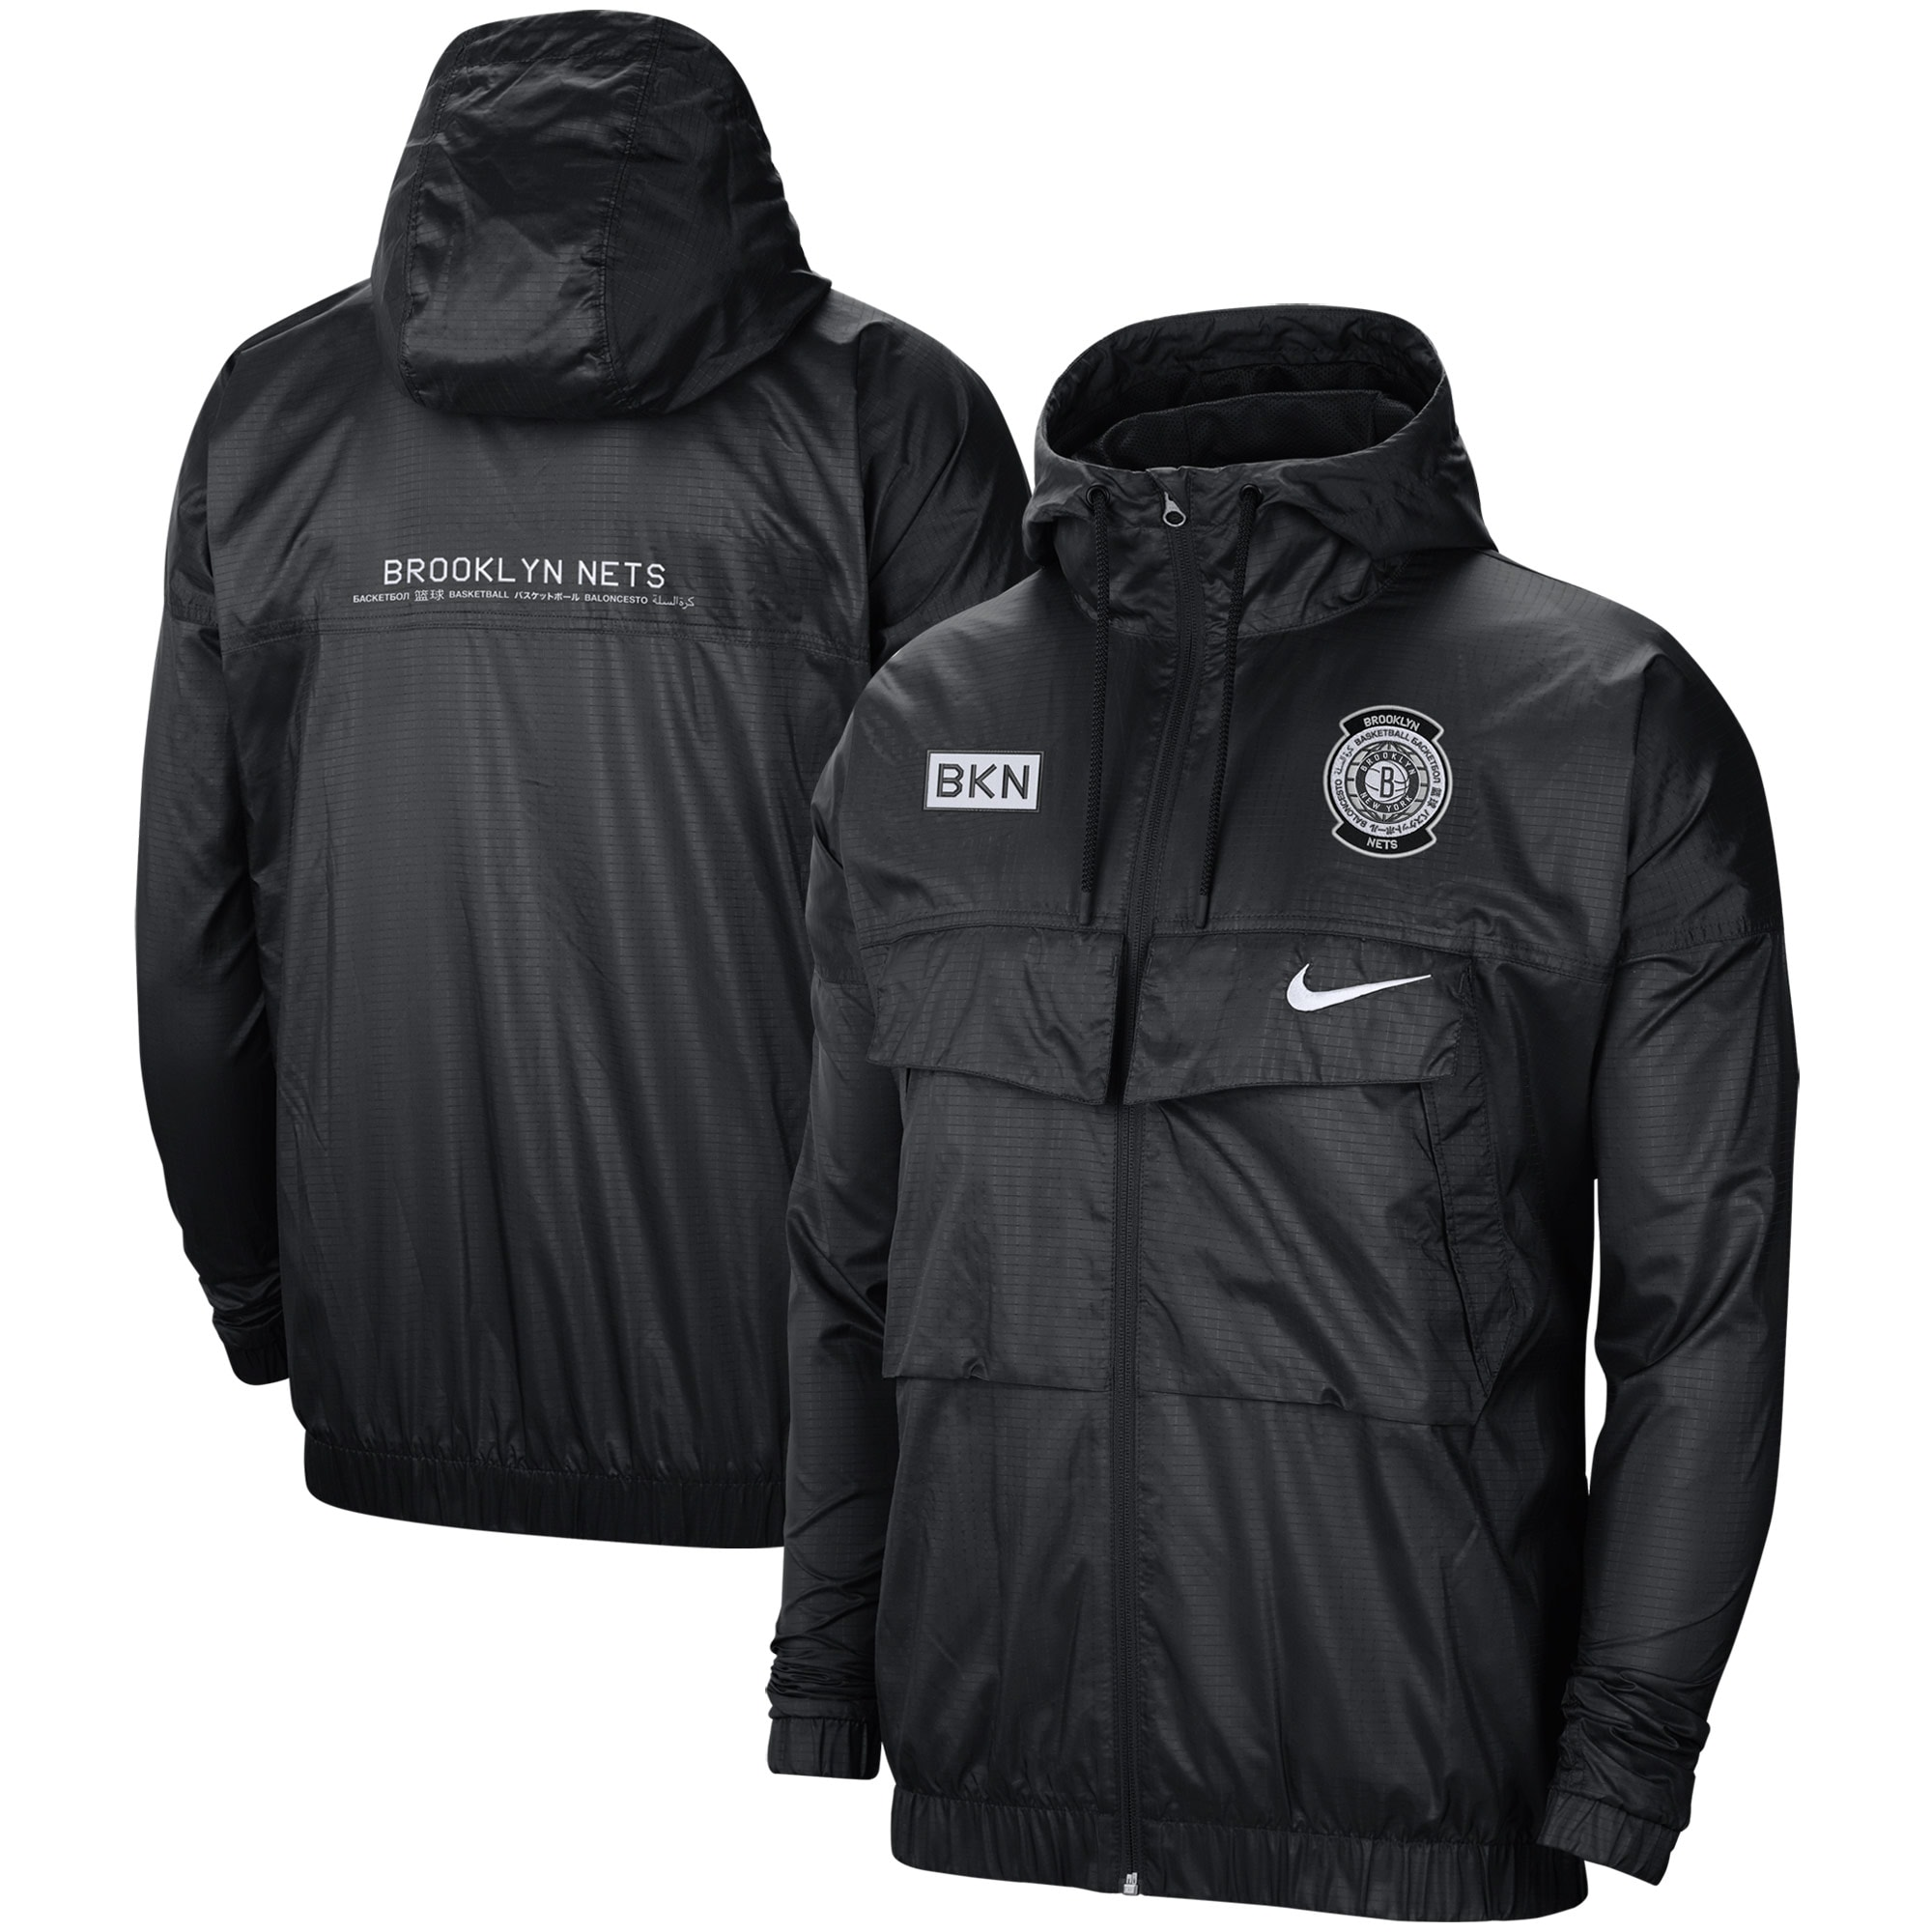 Brooklyn Nets Nike Courtside Global Exploration Lightweight Full-Zip Jacket - Black